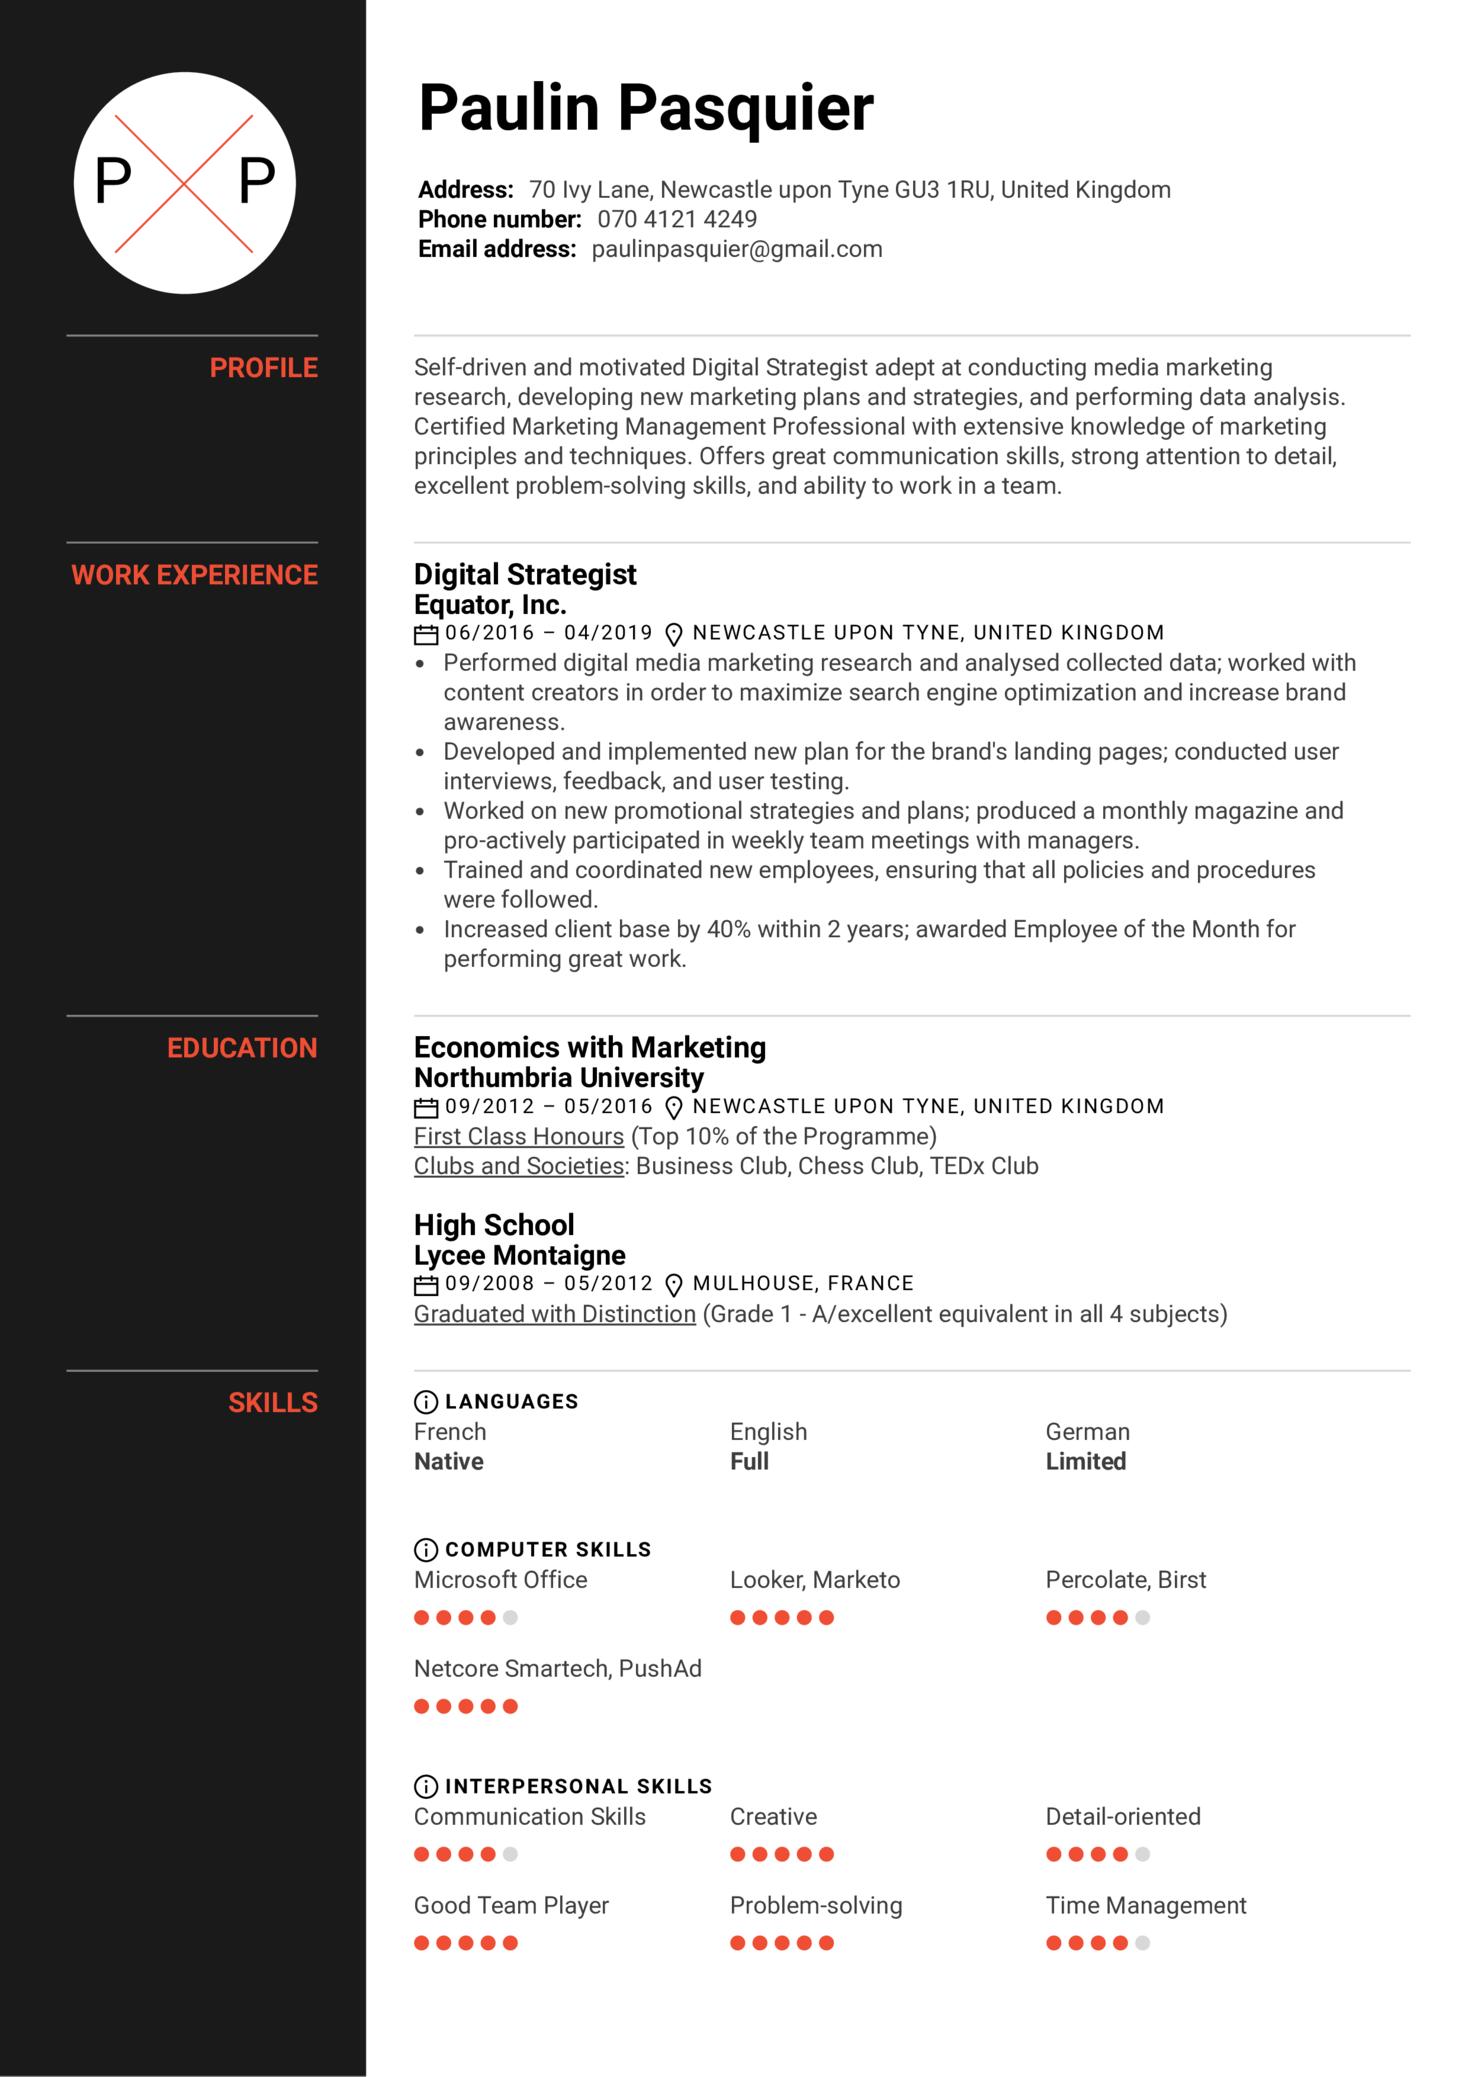 Digital Strategist Resume Example (Part 1)